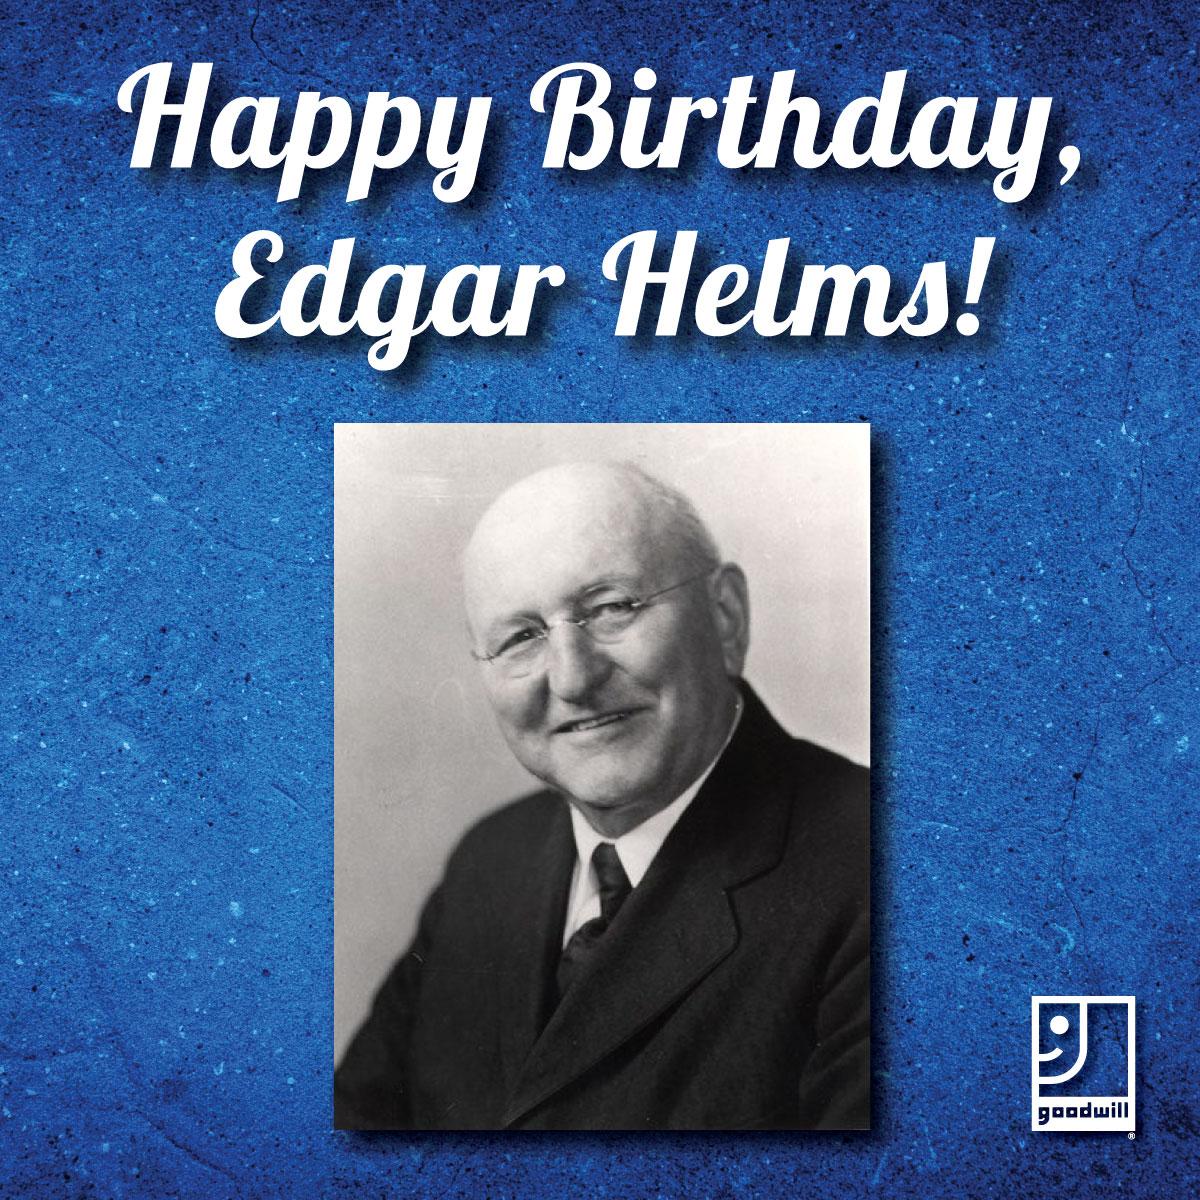 Happy Birthday, Edgar Helms!